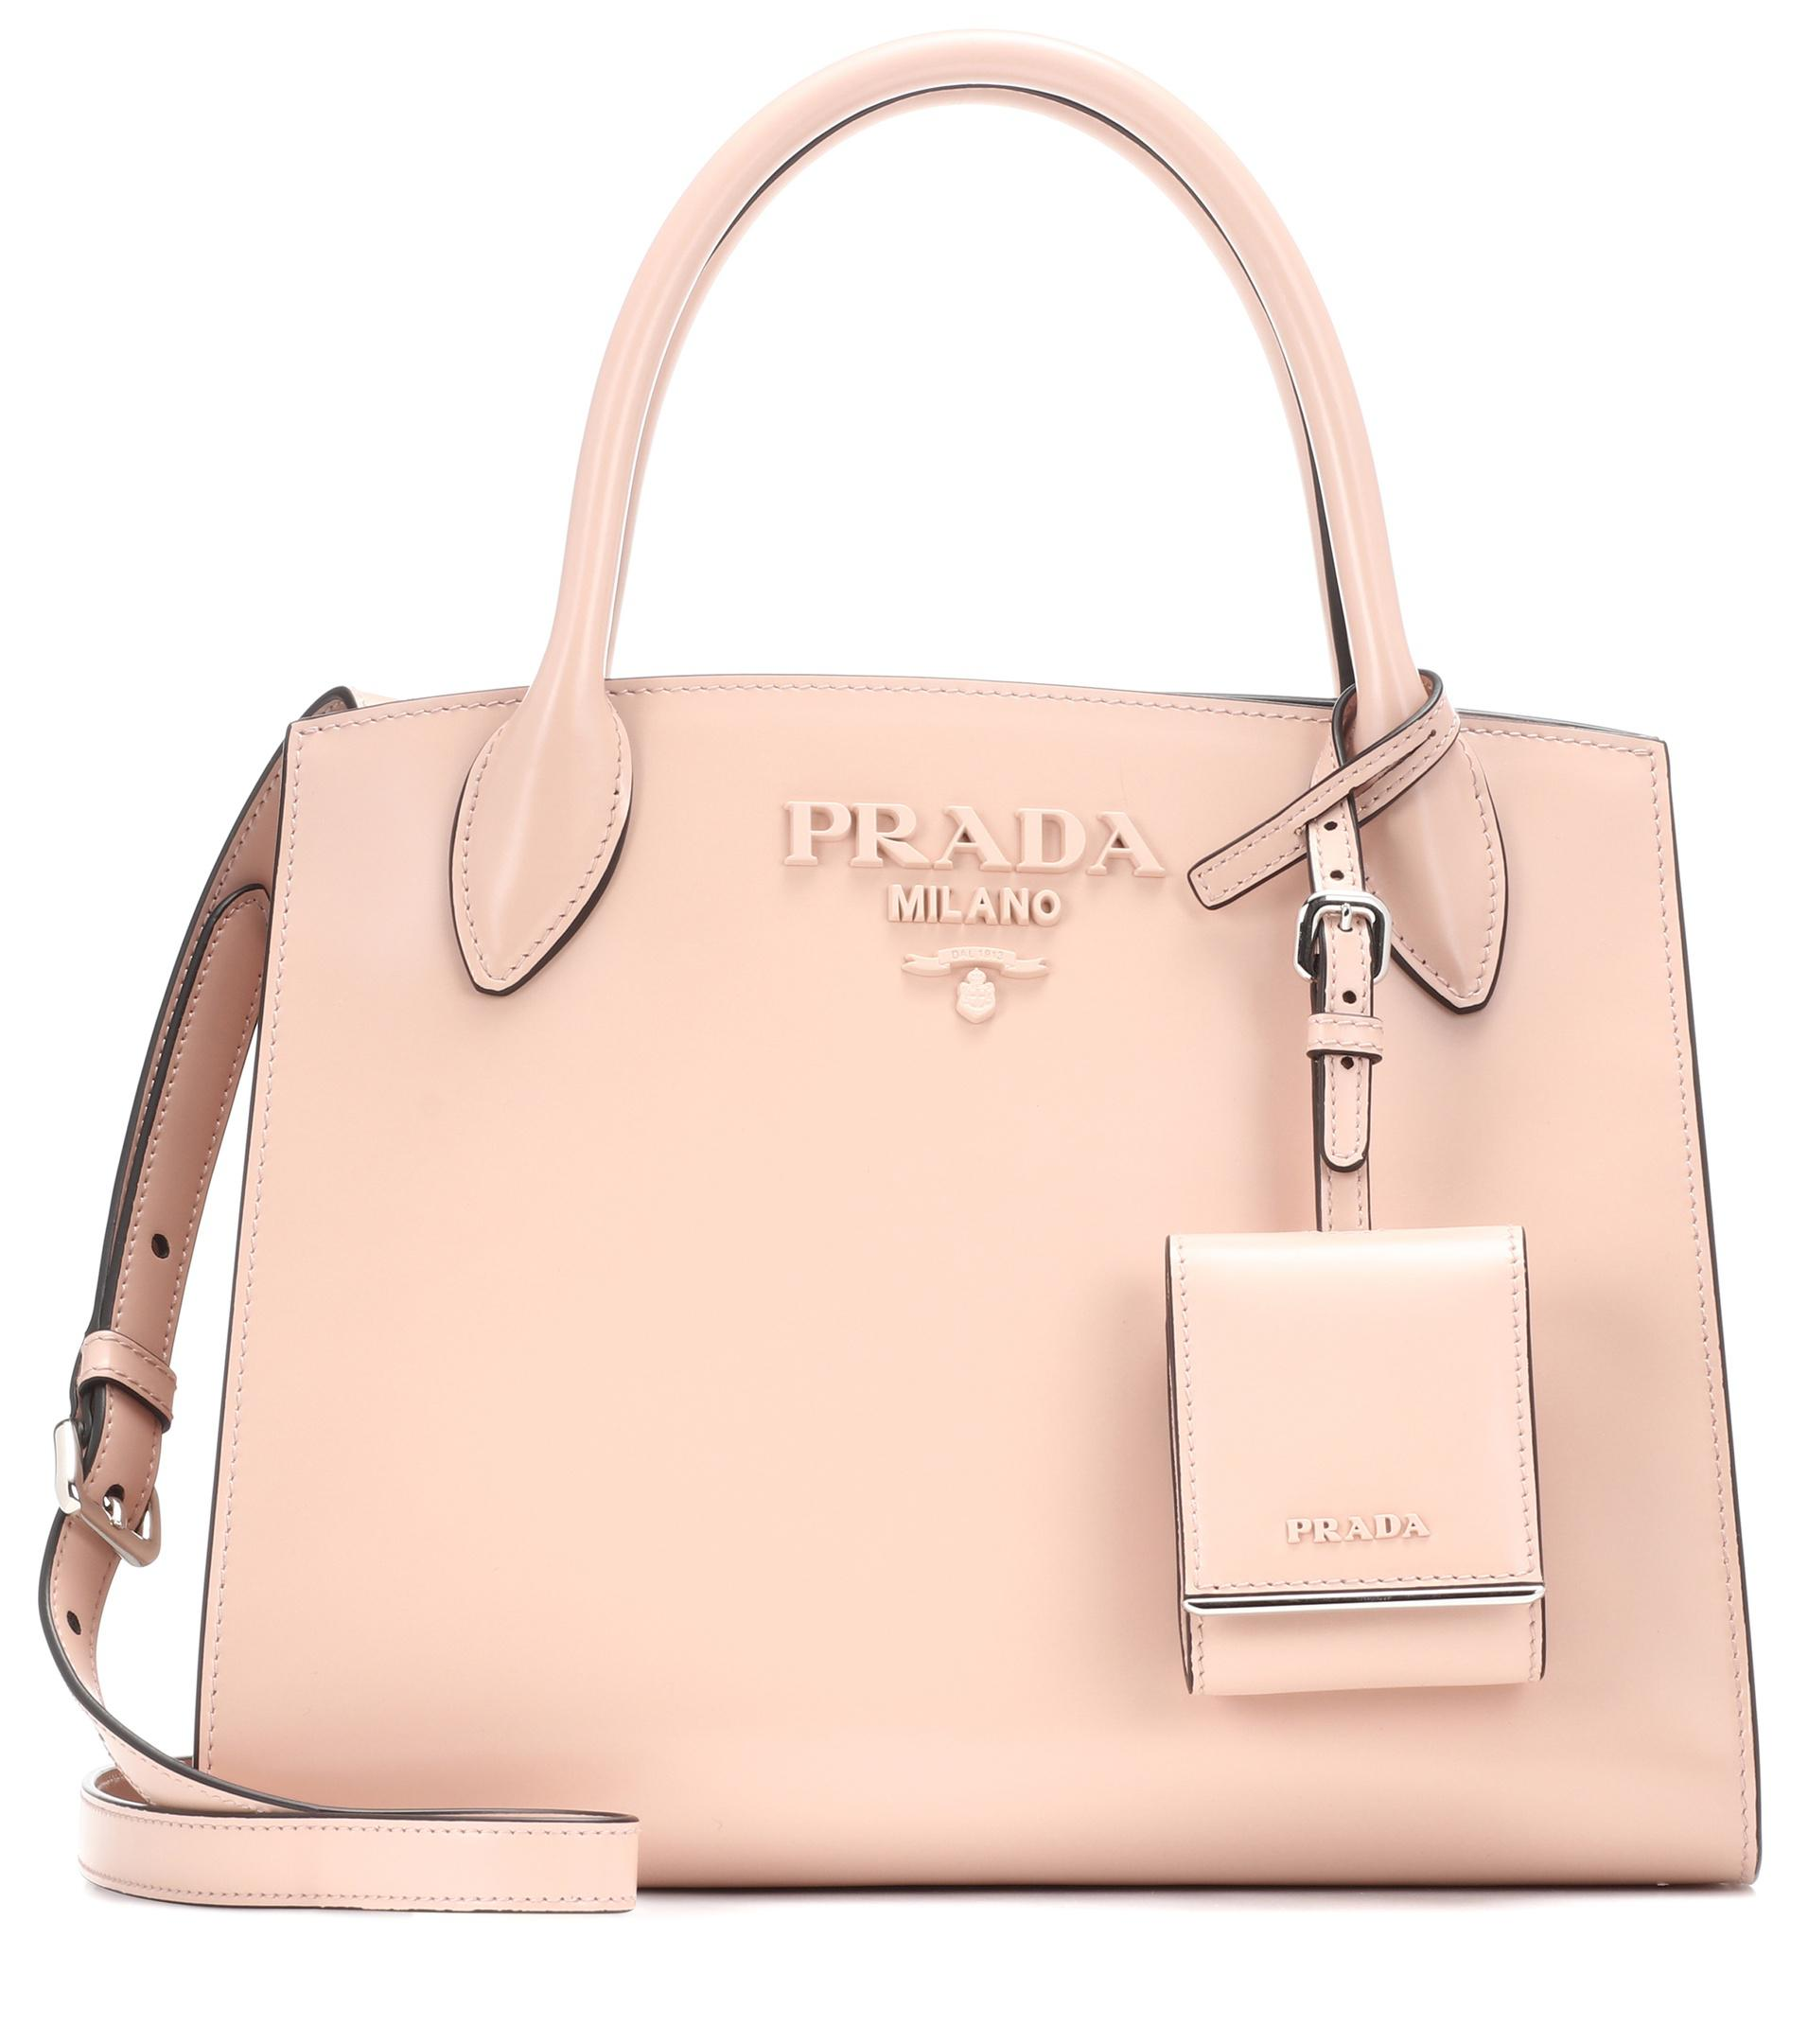 68ed6c997667 Prada - Pink Monochrome Leather Tote - Lyst. View fullscreen